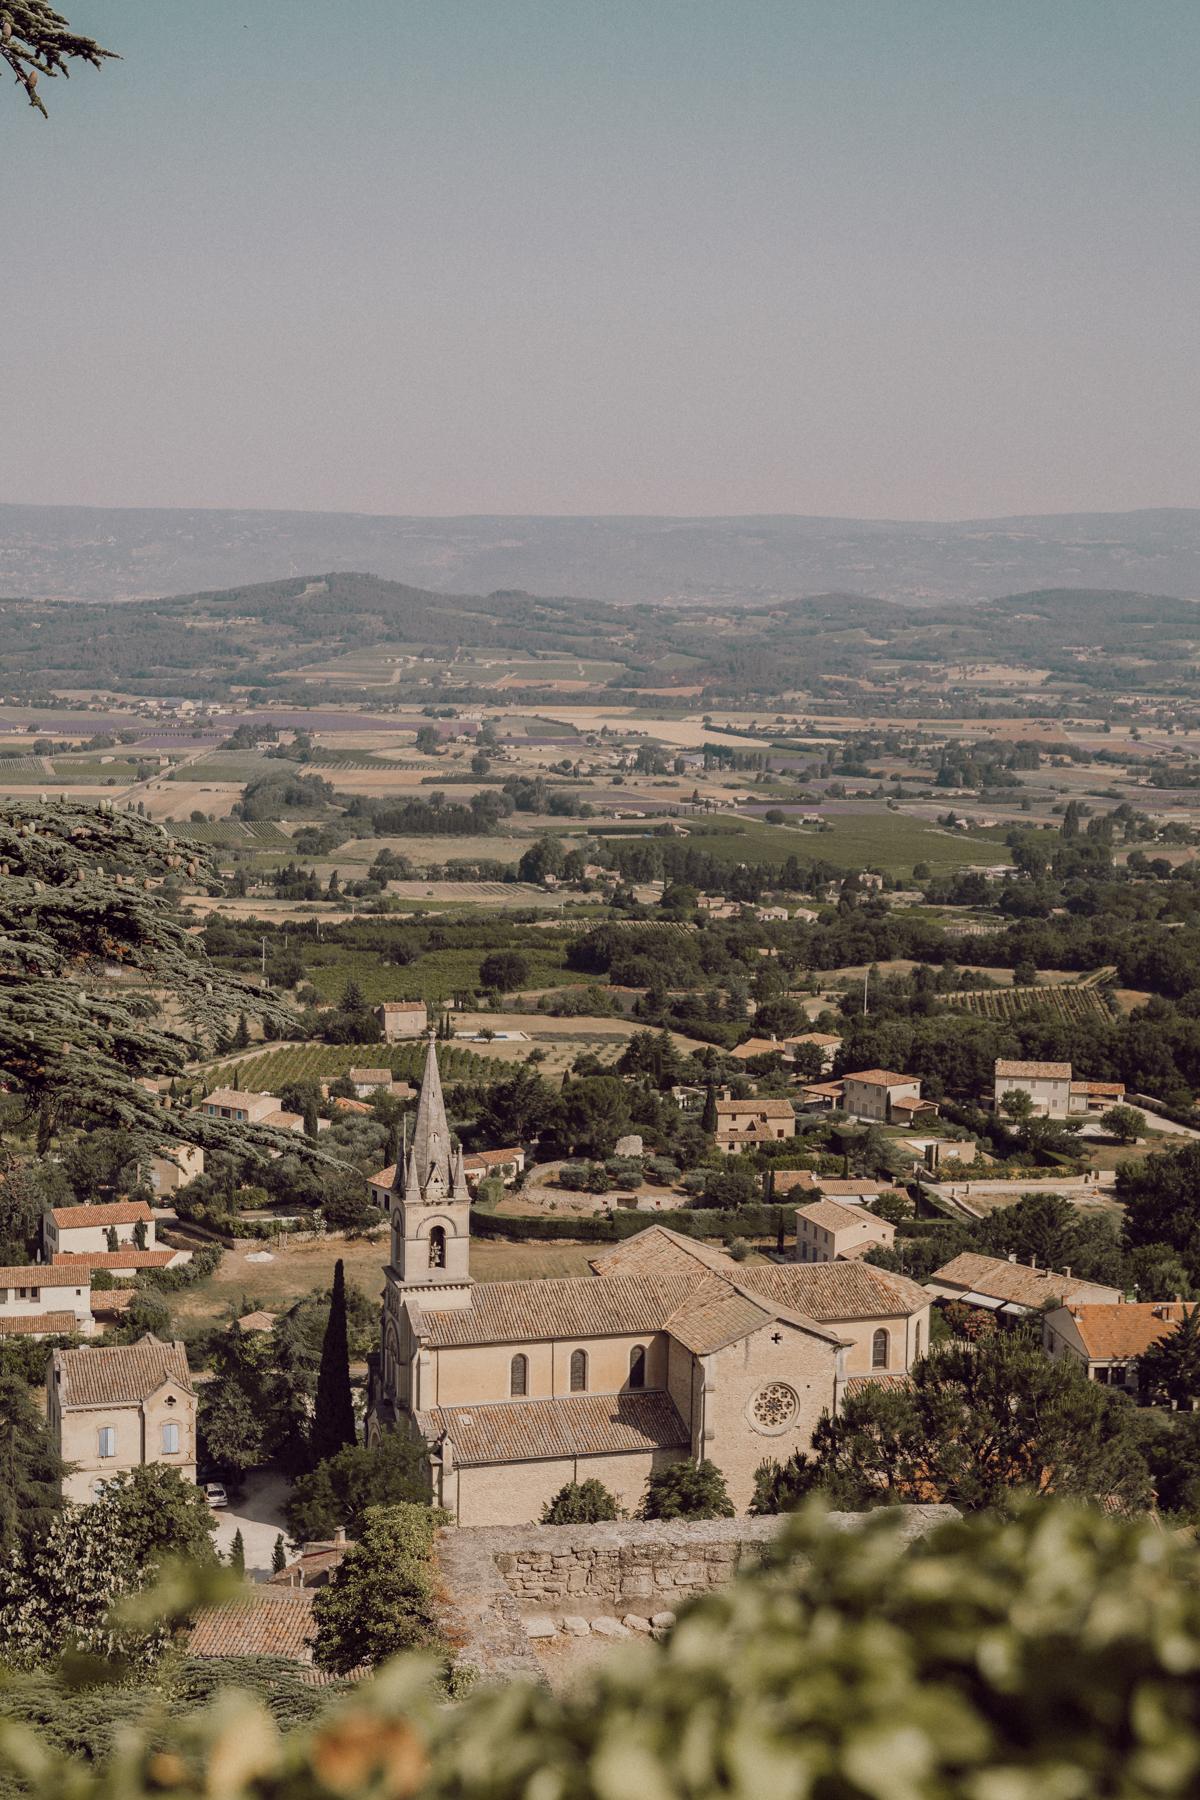 provence-2-bonnieux-apt-lourmarin-12